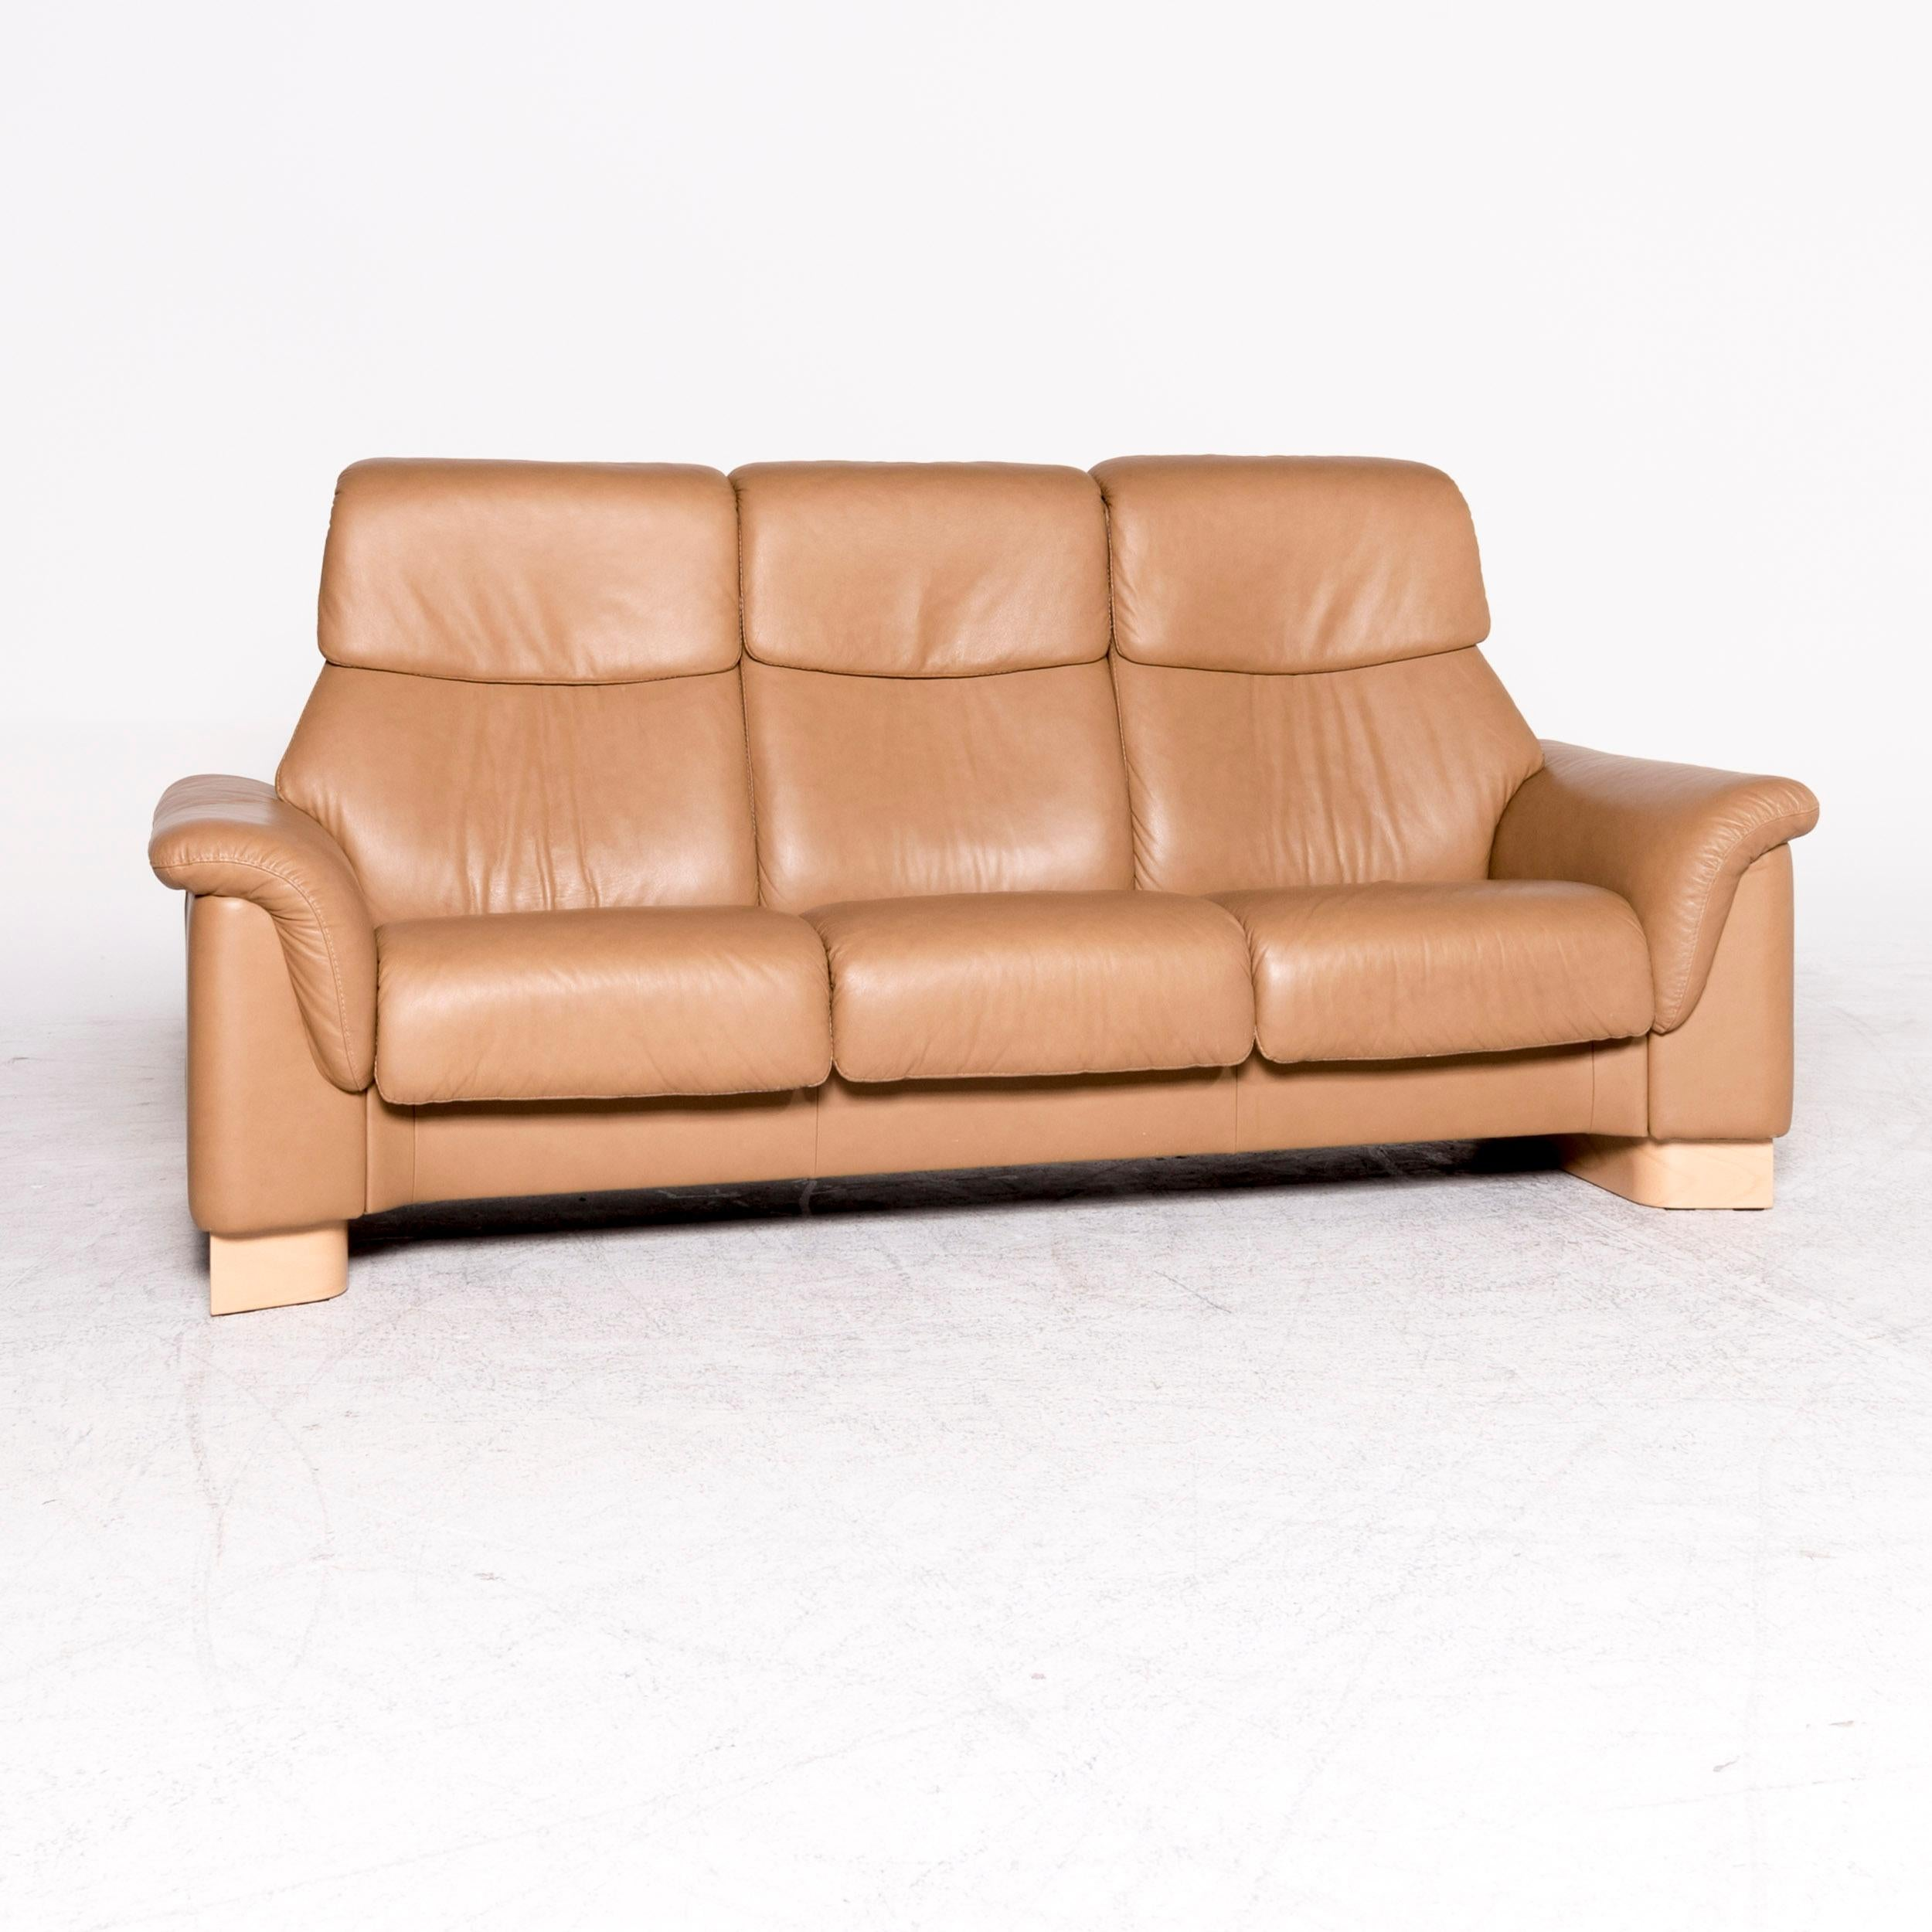 Stressless Paradise Designer Leather High Back Sofa Beige Genuine Leather